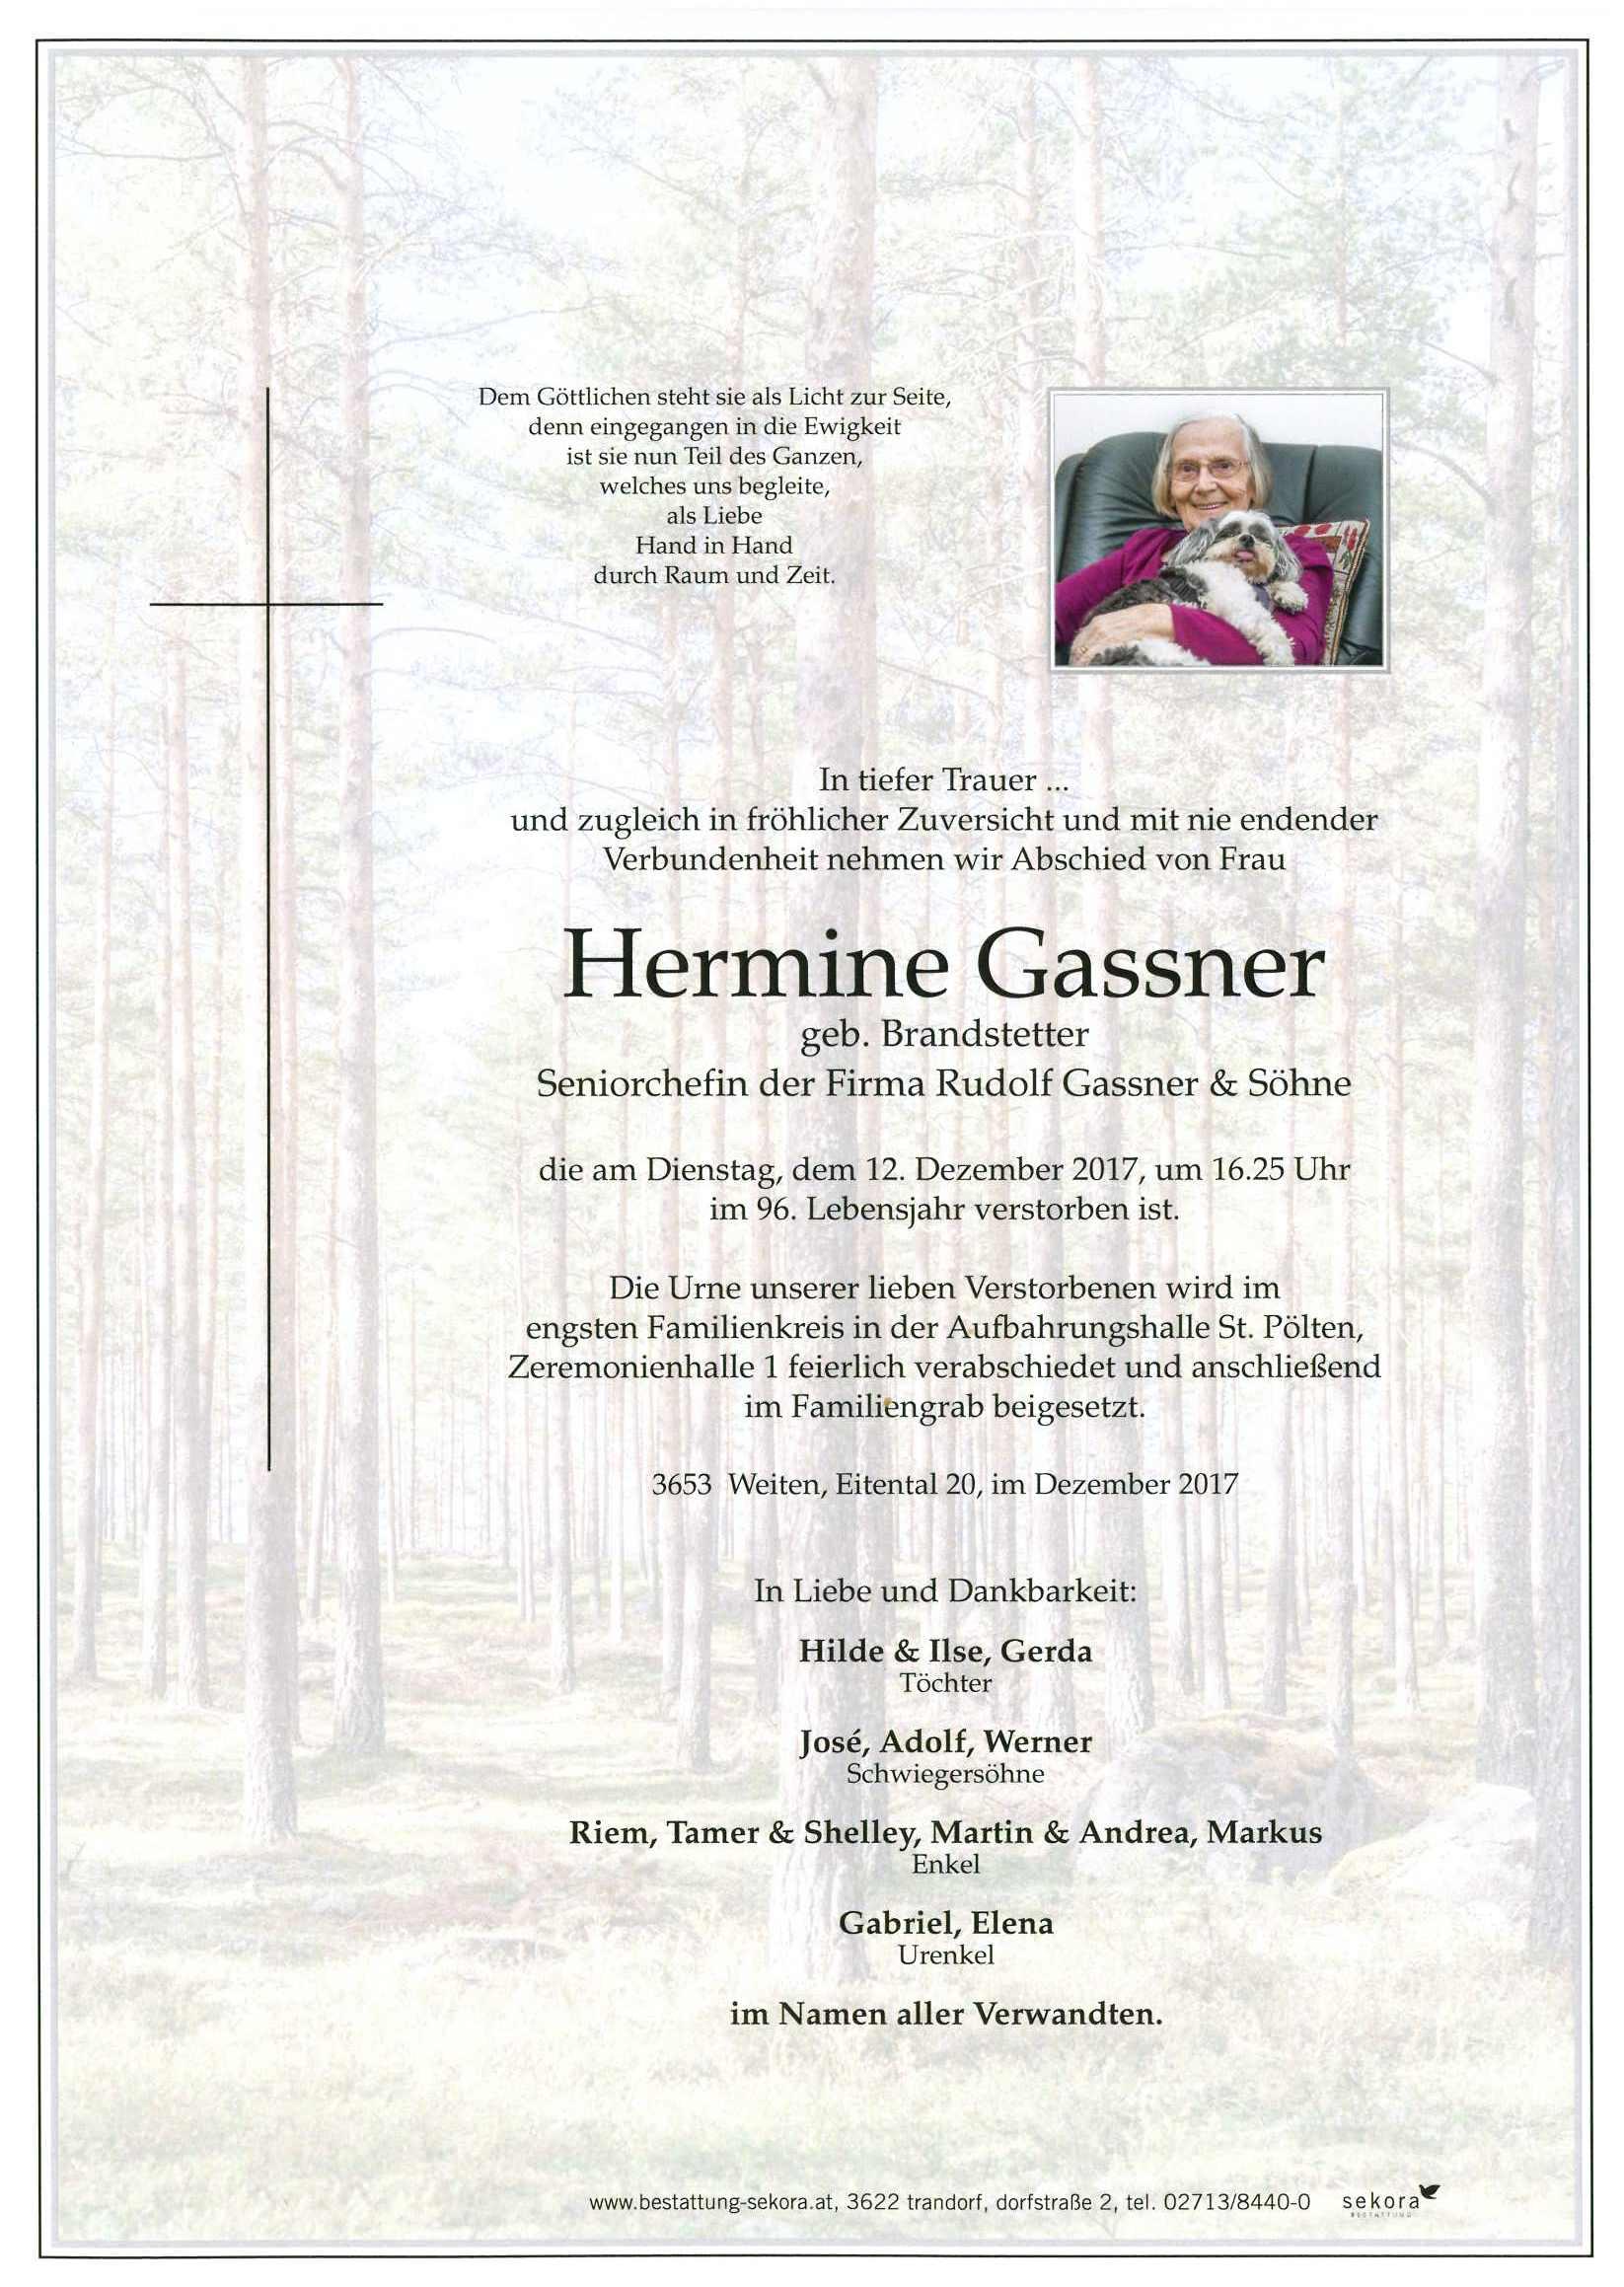 gassner hermine